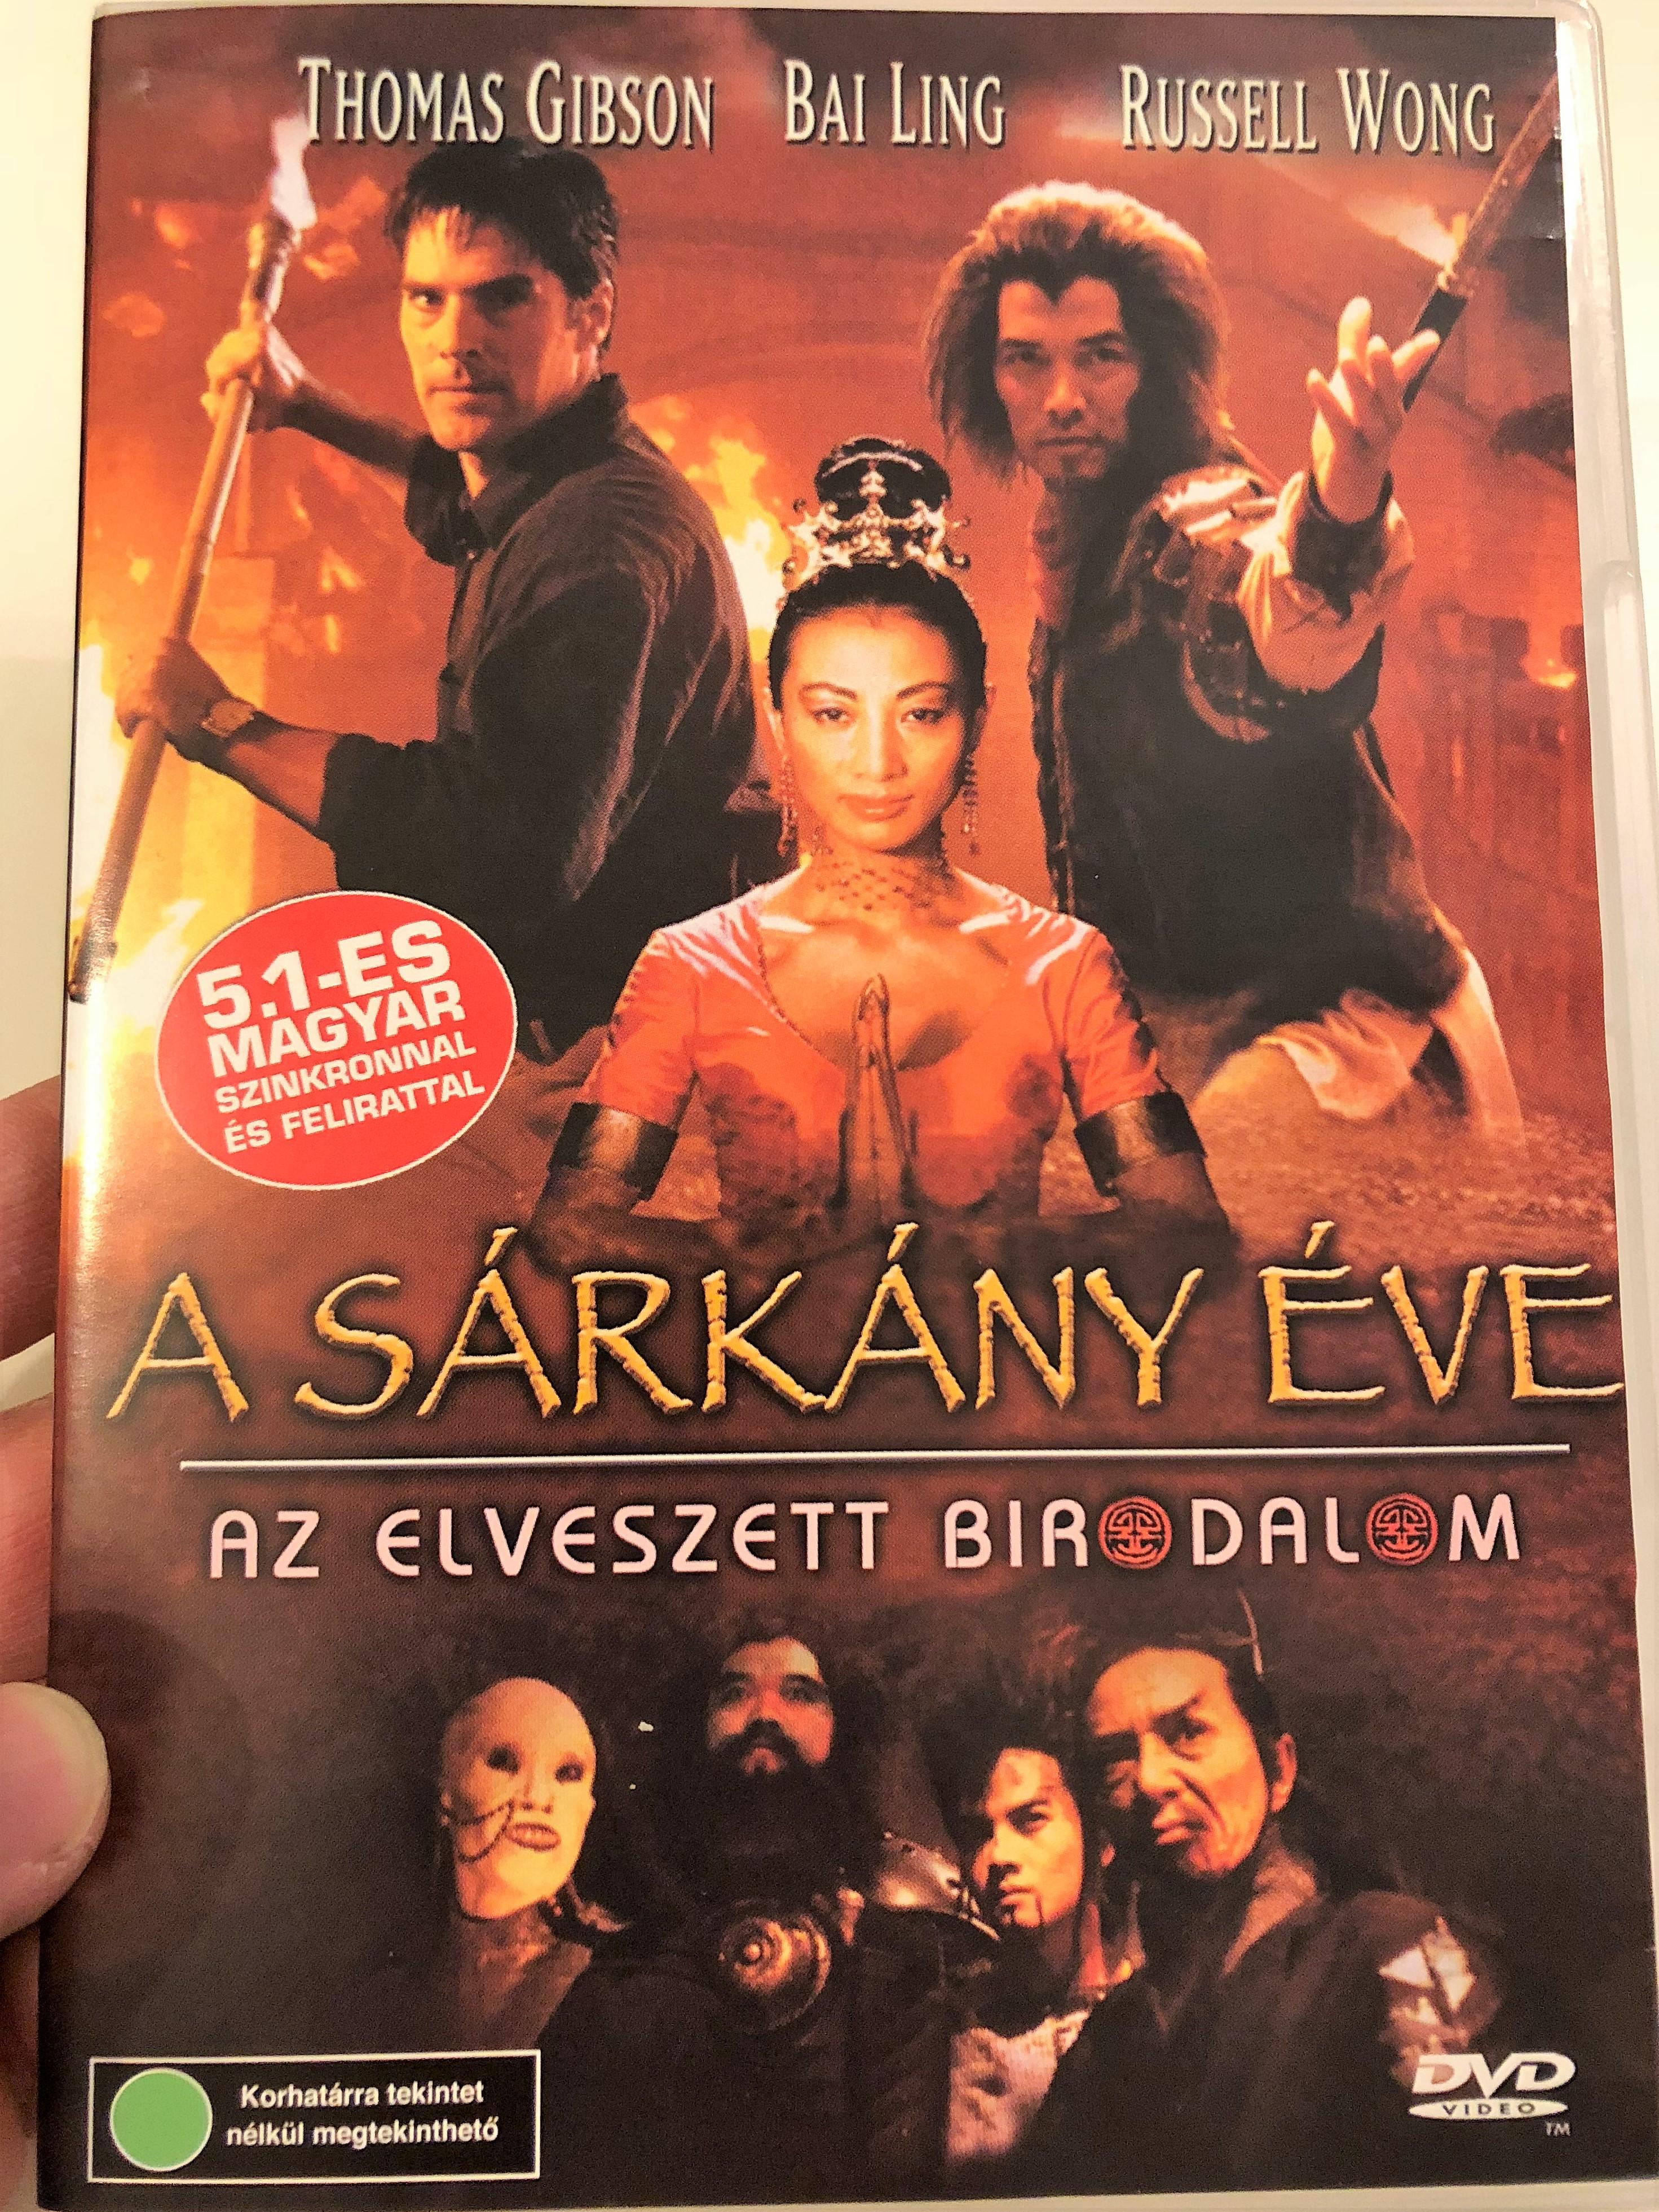 the-lost-empire-dvd-2001-a-s-rk-ny-ve-az-elveszett-birodalom-the-monkey-king-directed-by-peter-macdonald-starring-thomas-gibson-bai-ling-russel-wong-1-.jpg